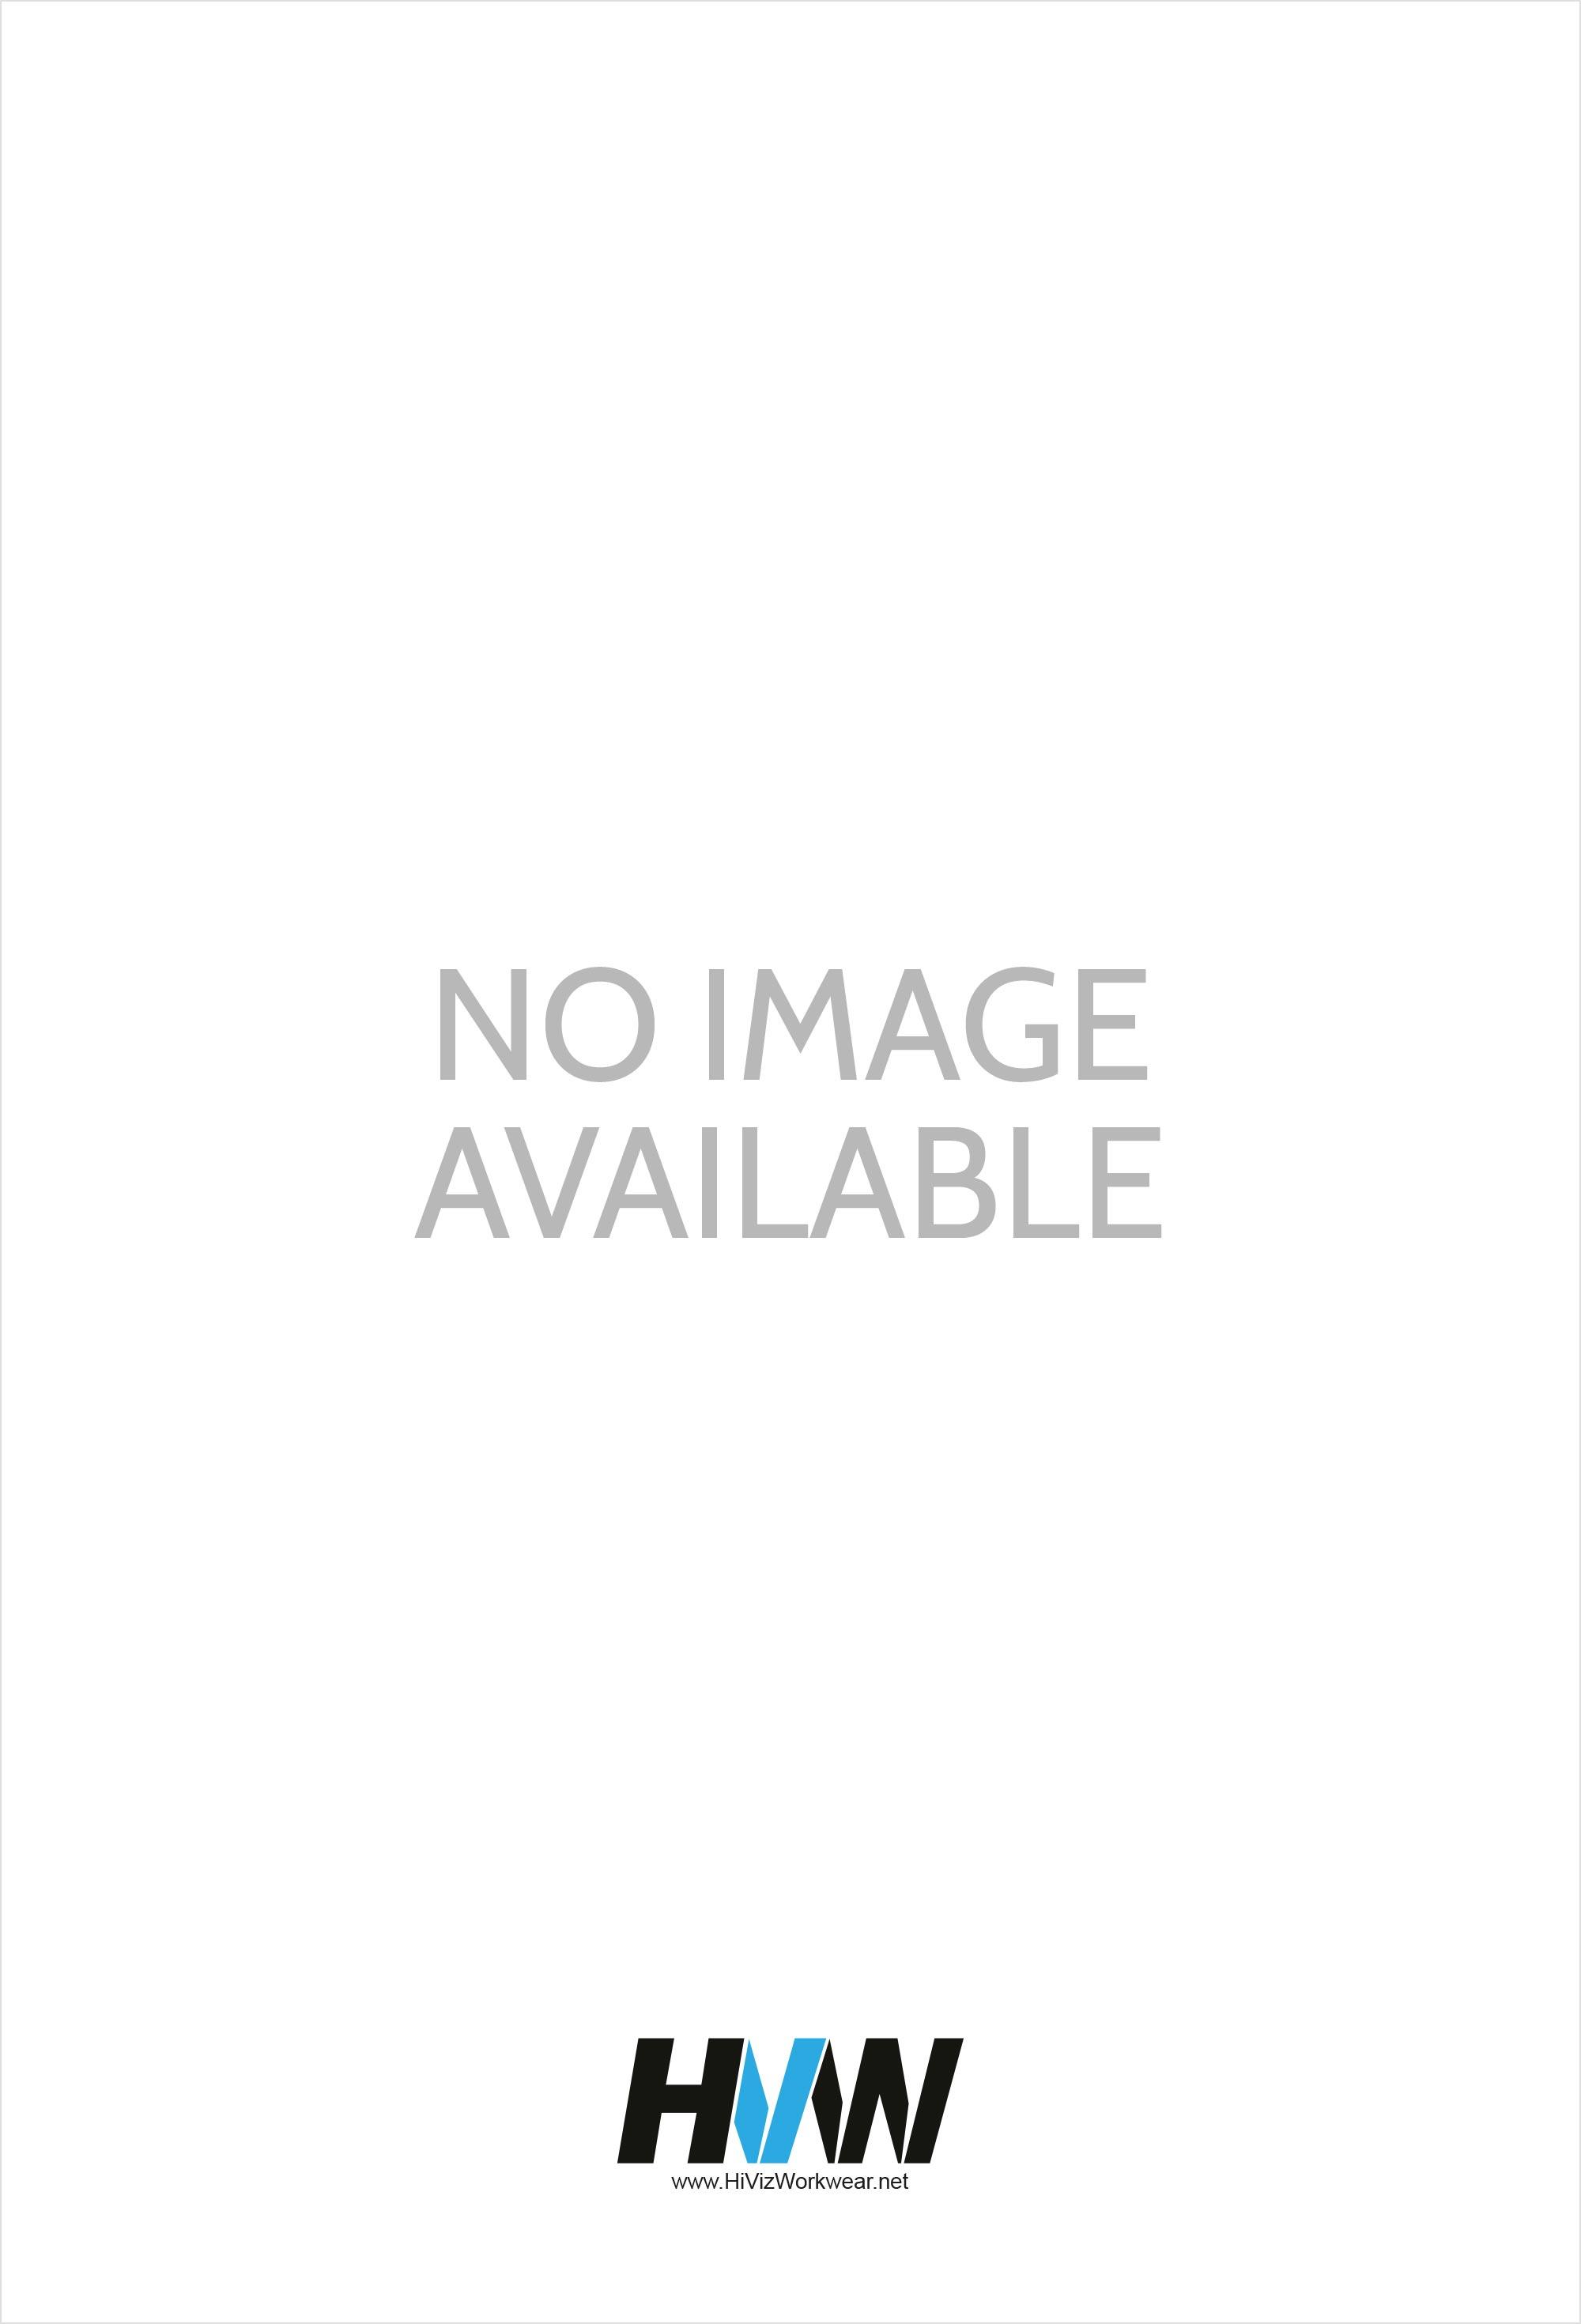 RE95A Heavy Weight Waterproof Jacket/Pants Suit